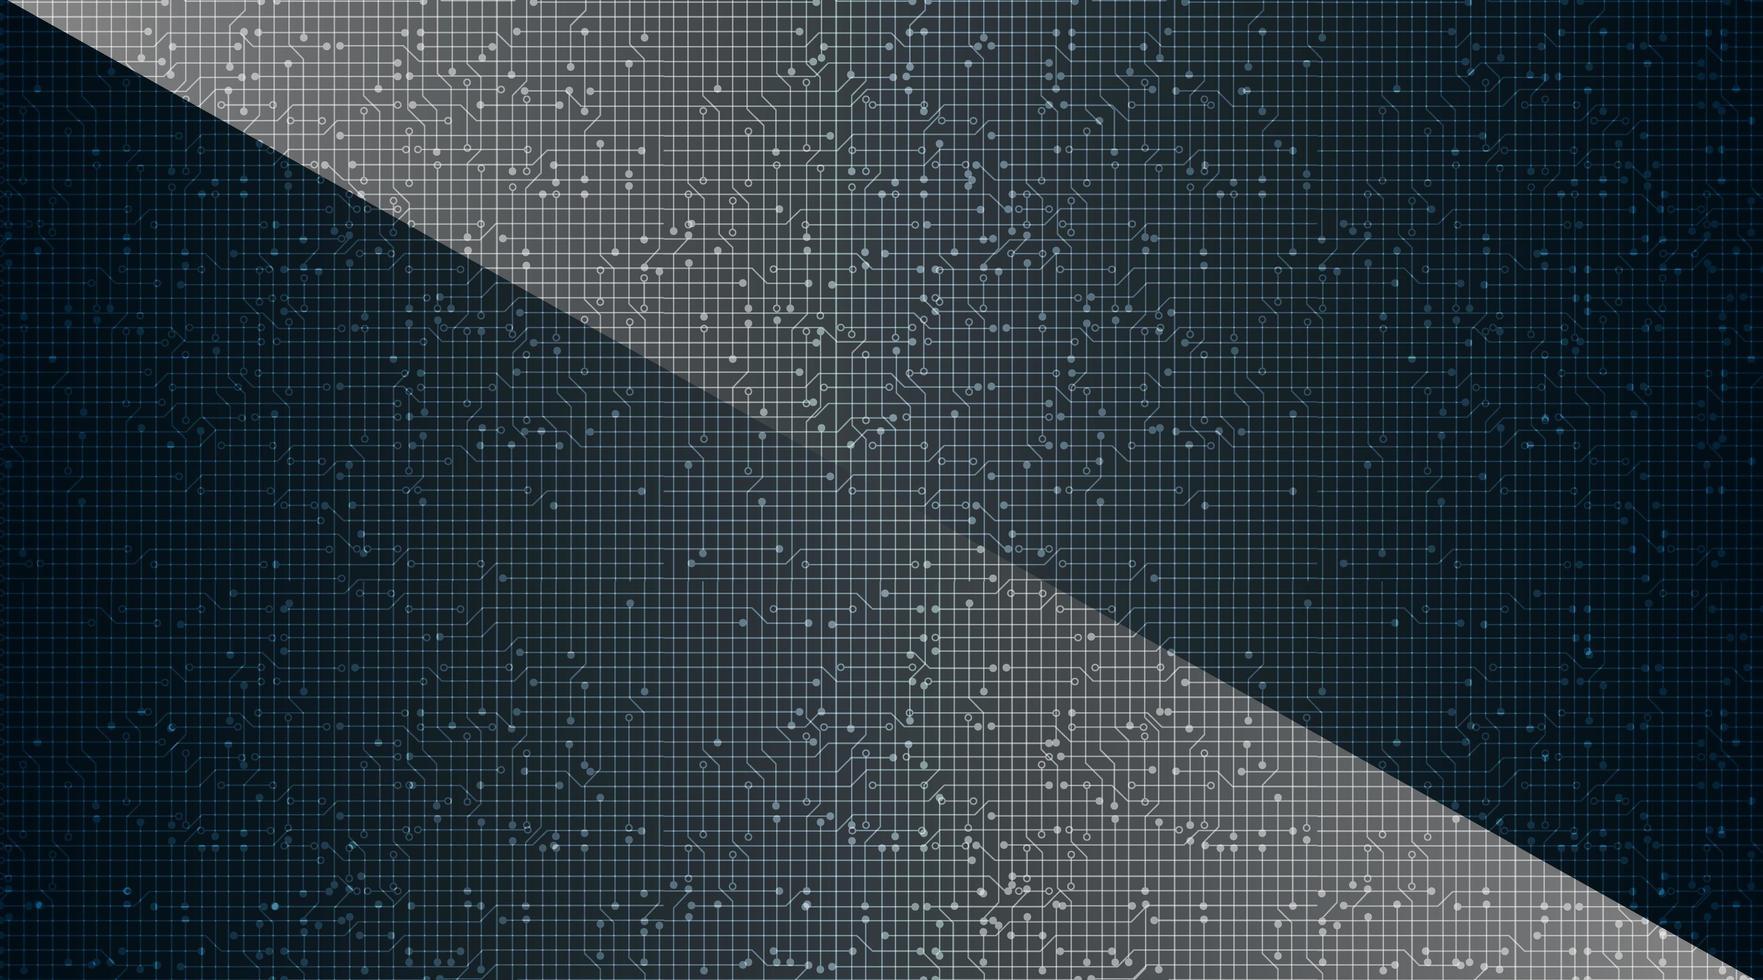 Donkere Microchip op technische achtergrond. vector